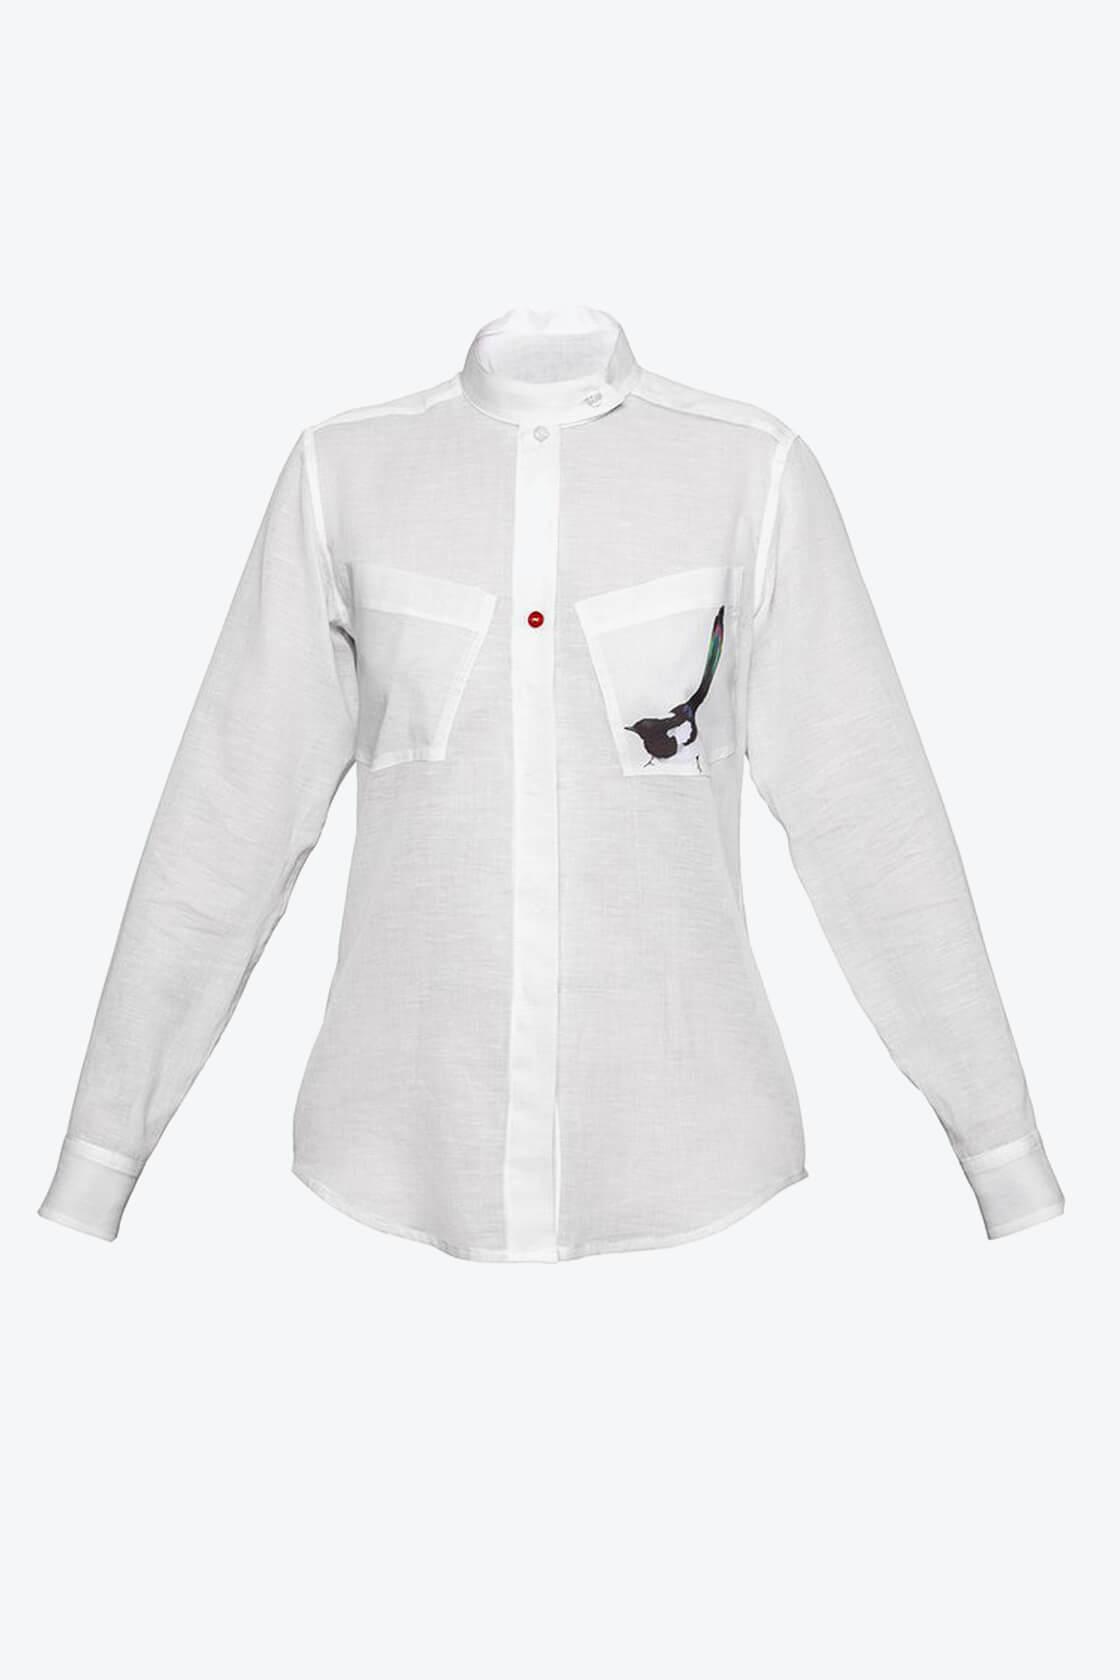 OL10000186 Magpie shirt1